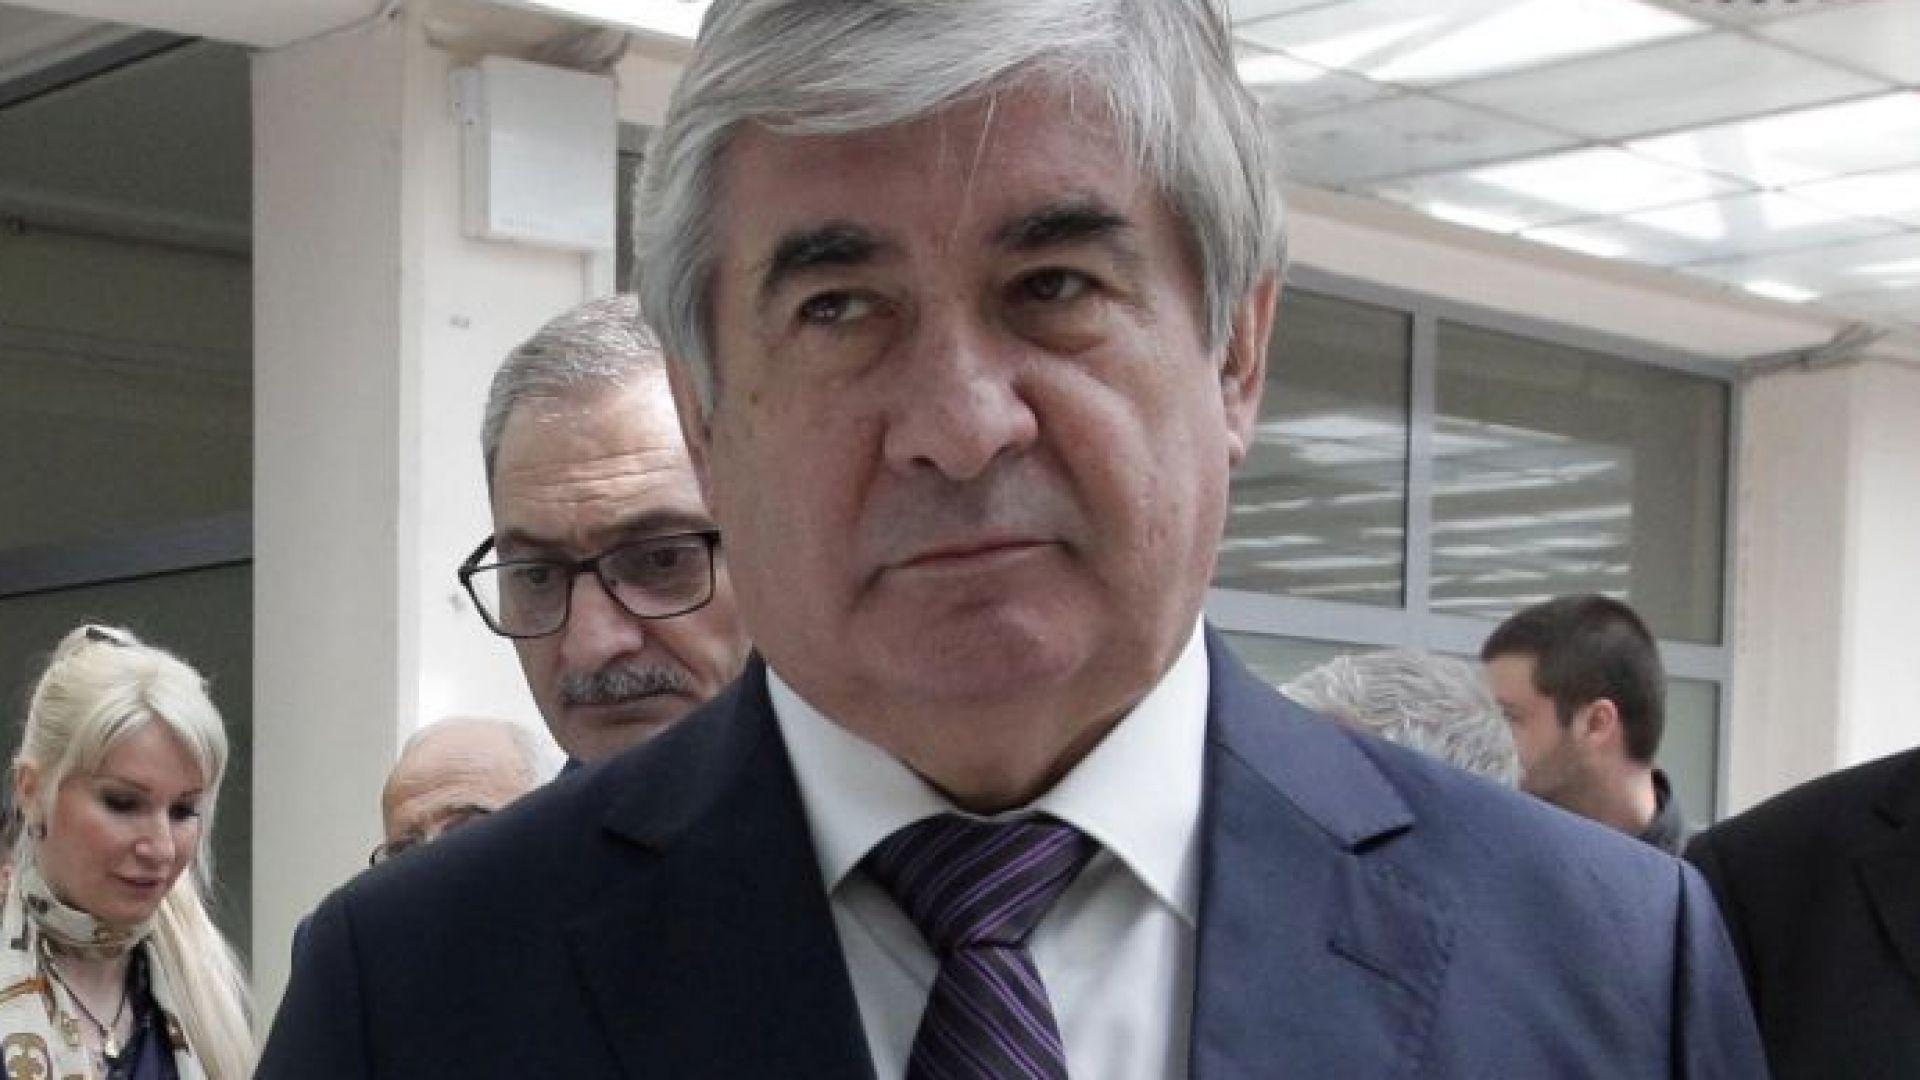 Руският посланик: Порошенко организира провокация заради изборите, но не се готвим за война